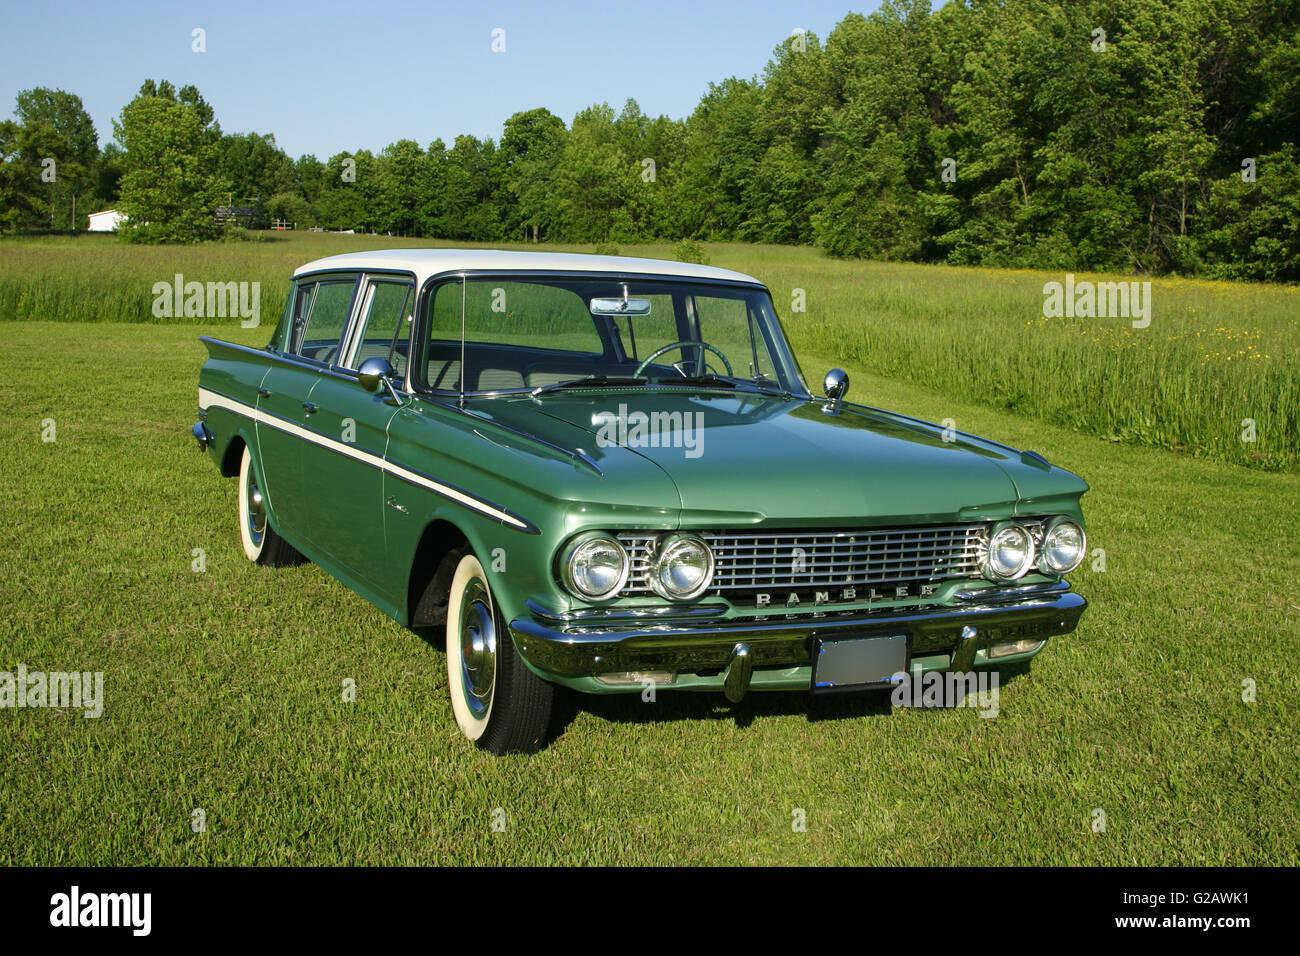 1961 AMC Rambler Classic - Stock Image